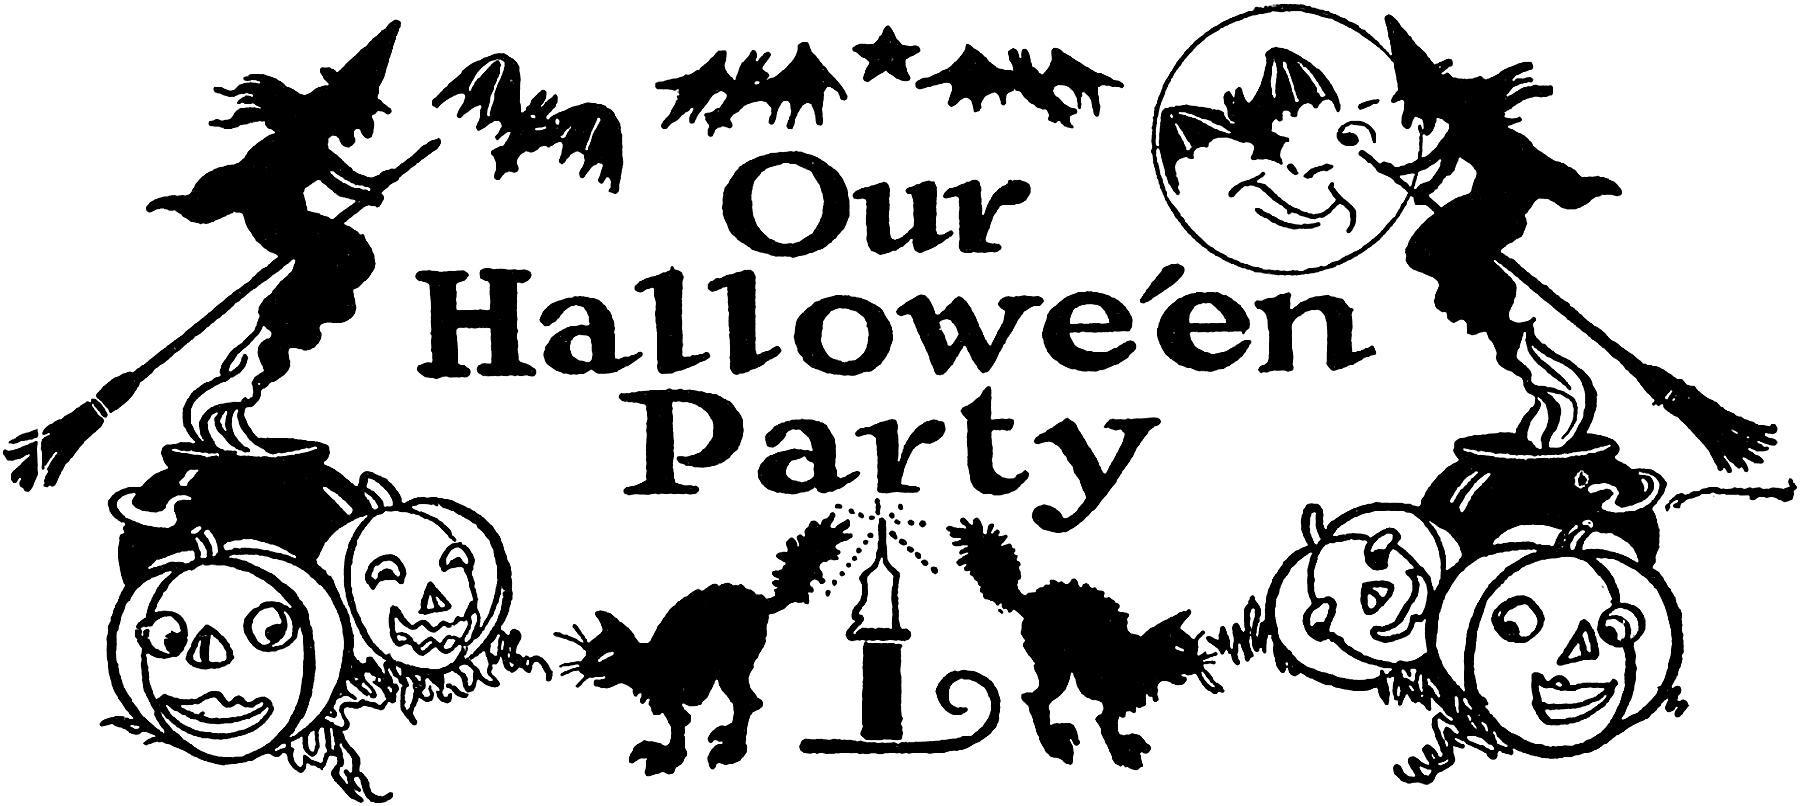 Nostalgic Black And White Halloween Party Clip Art